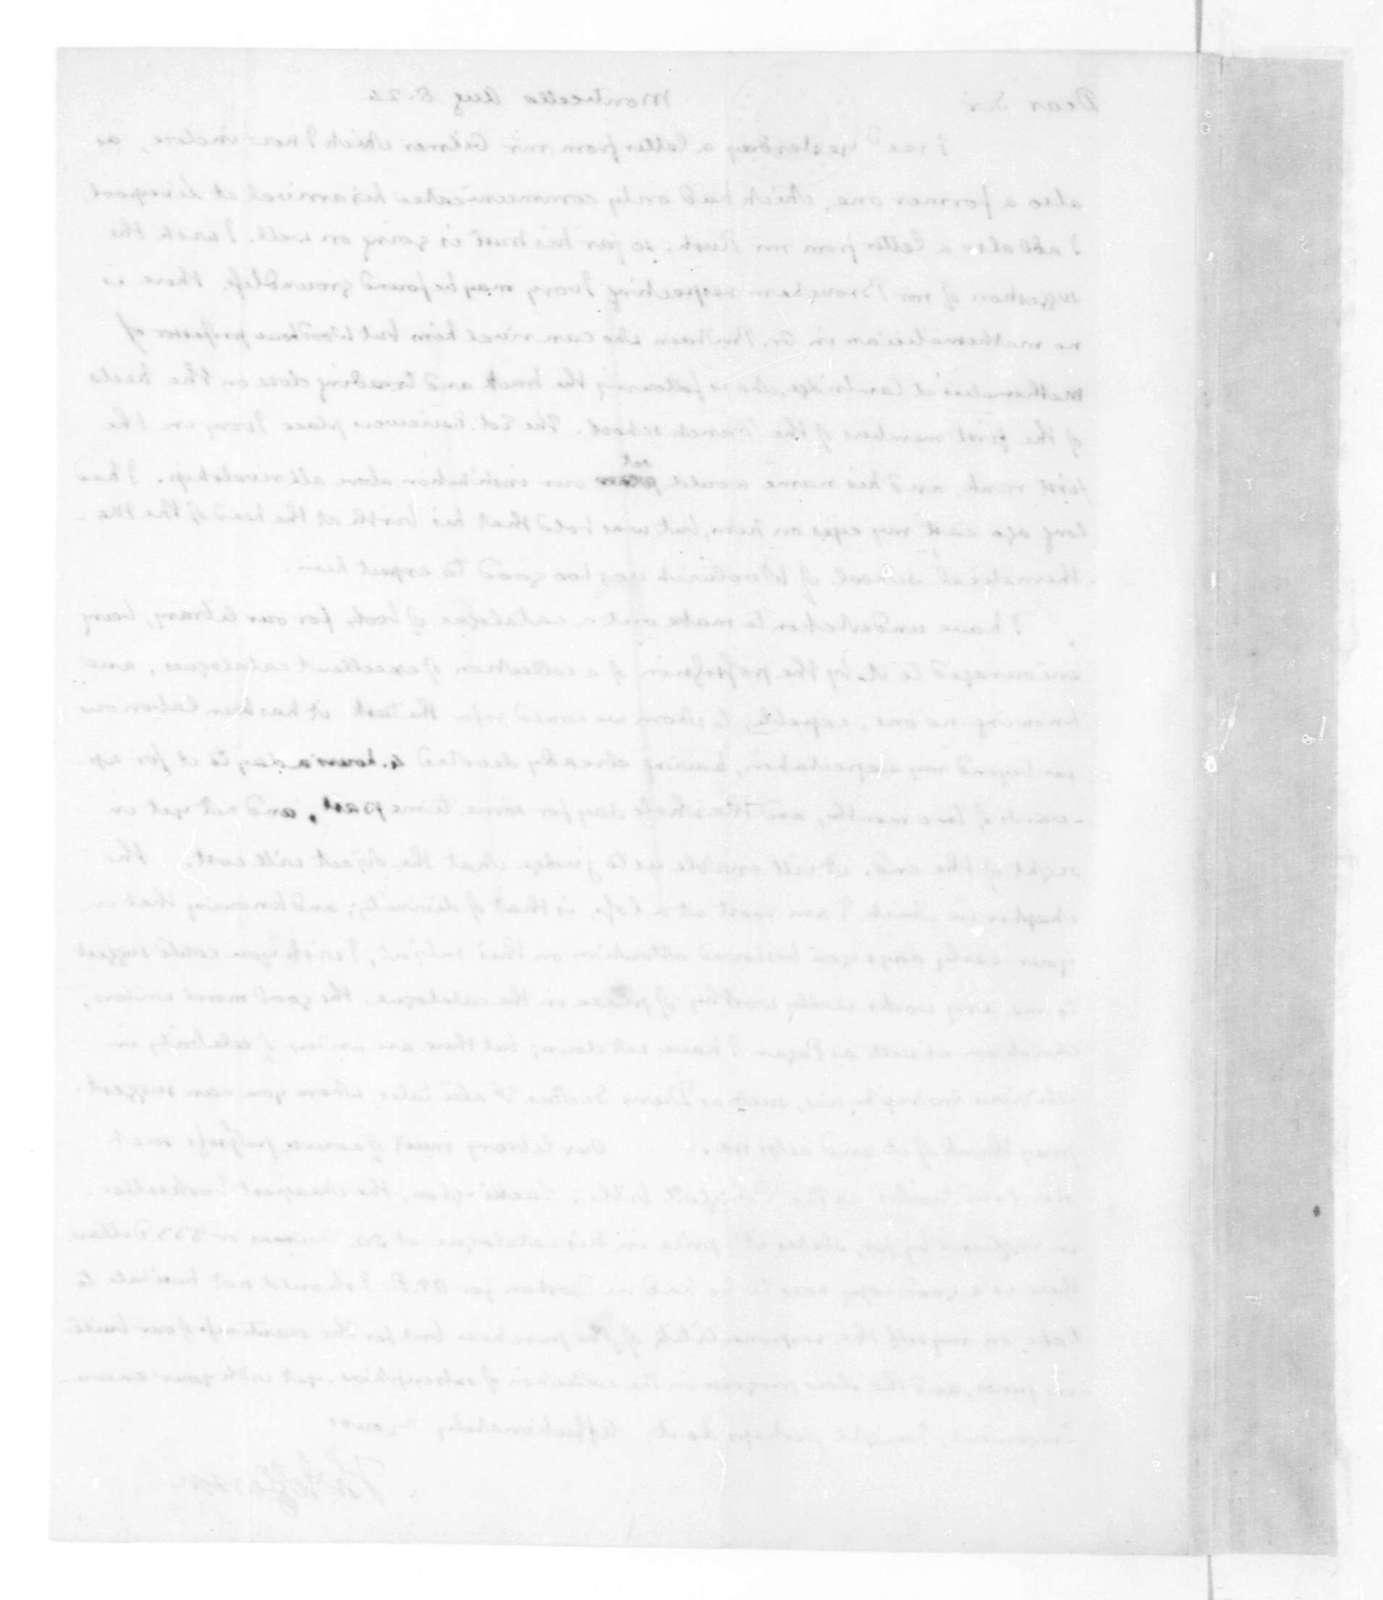 Thomas Jefferson to James Madison, August 8, 1824.